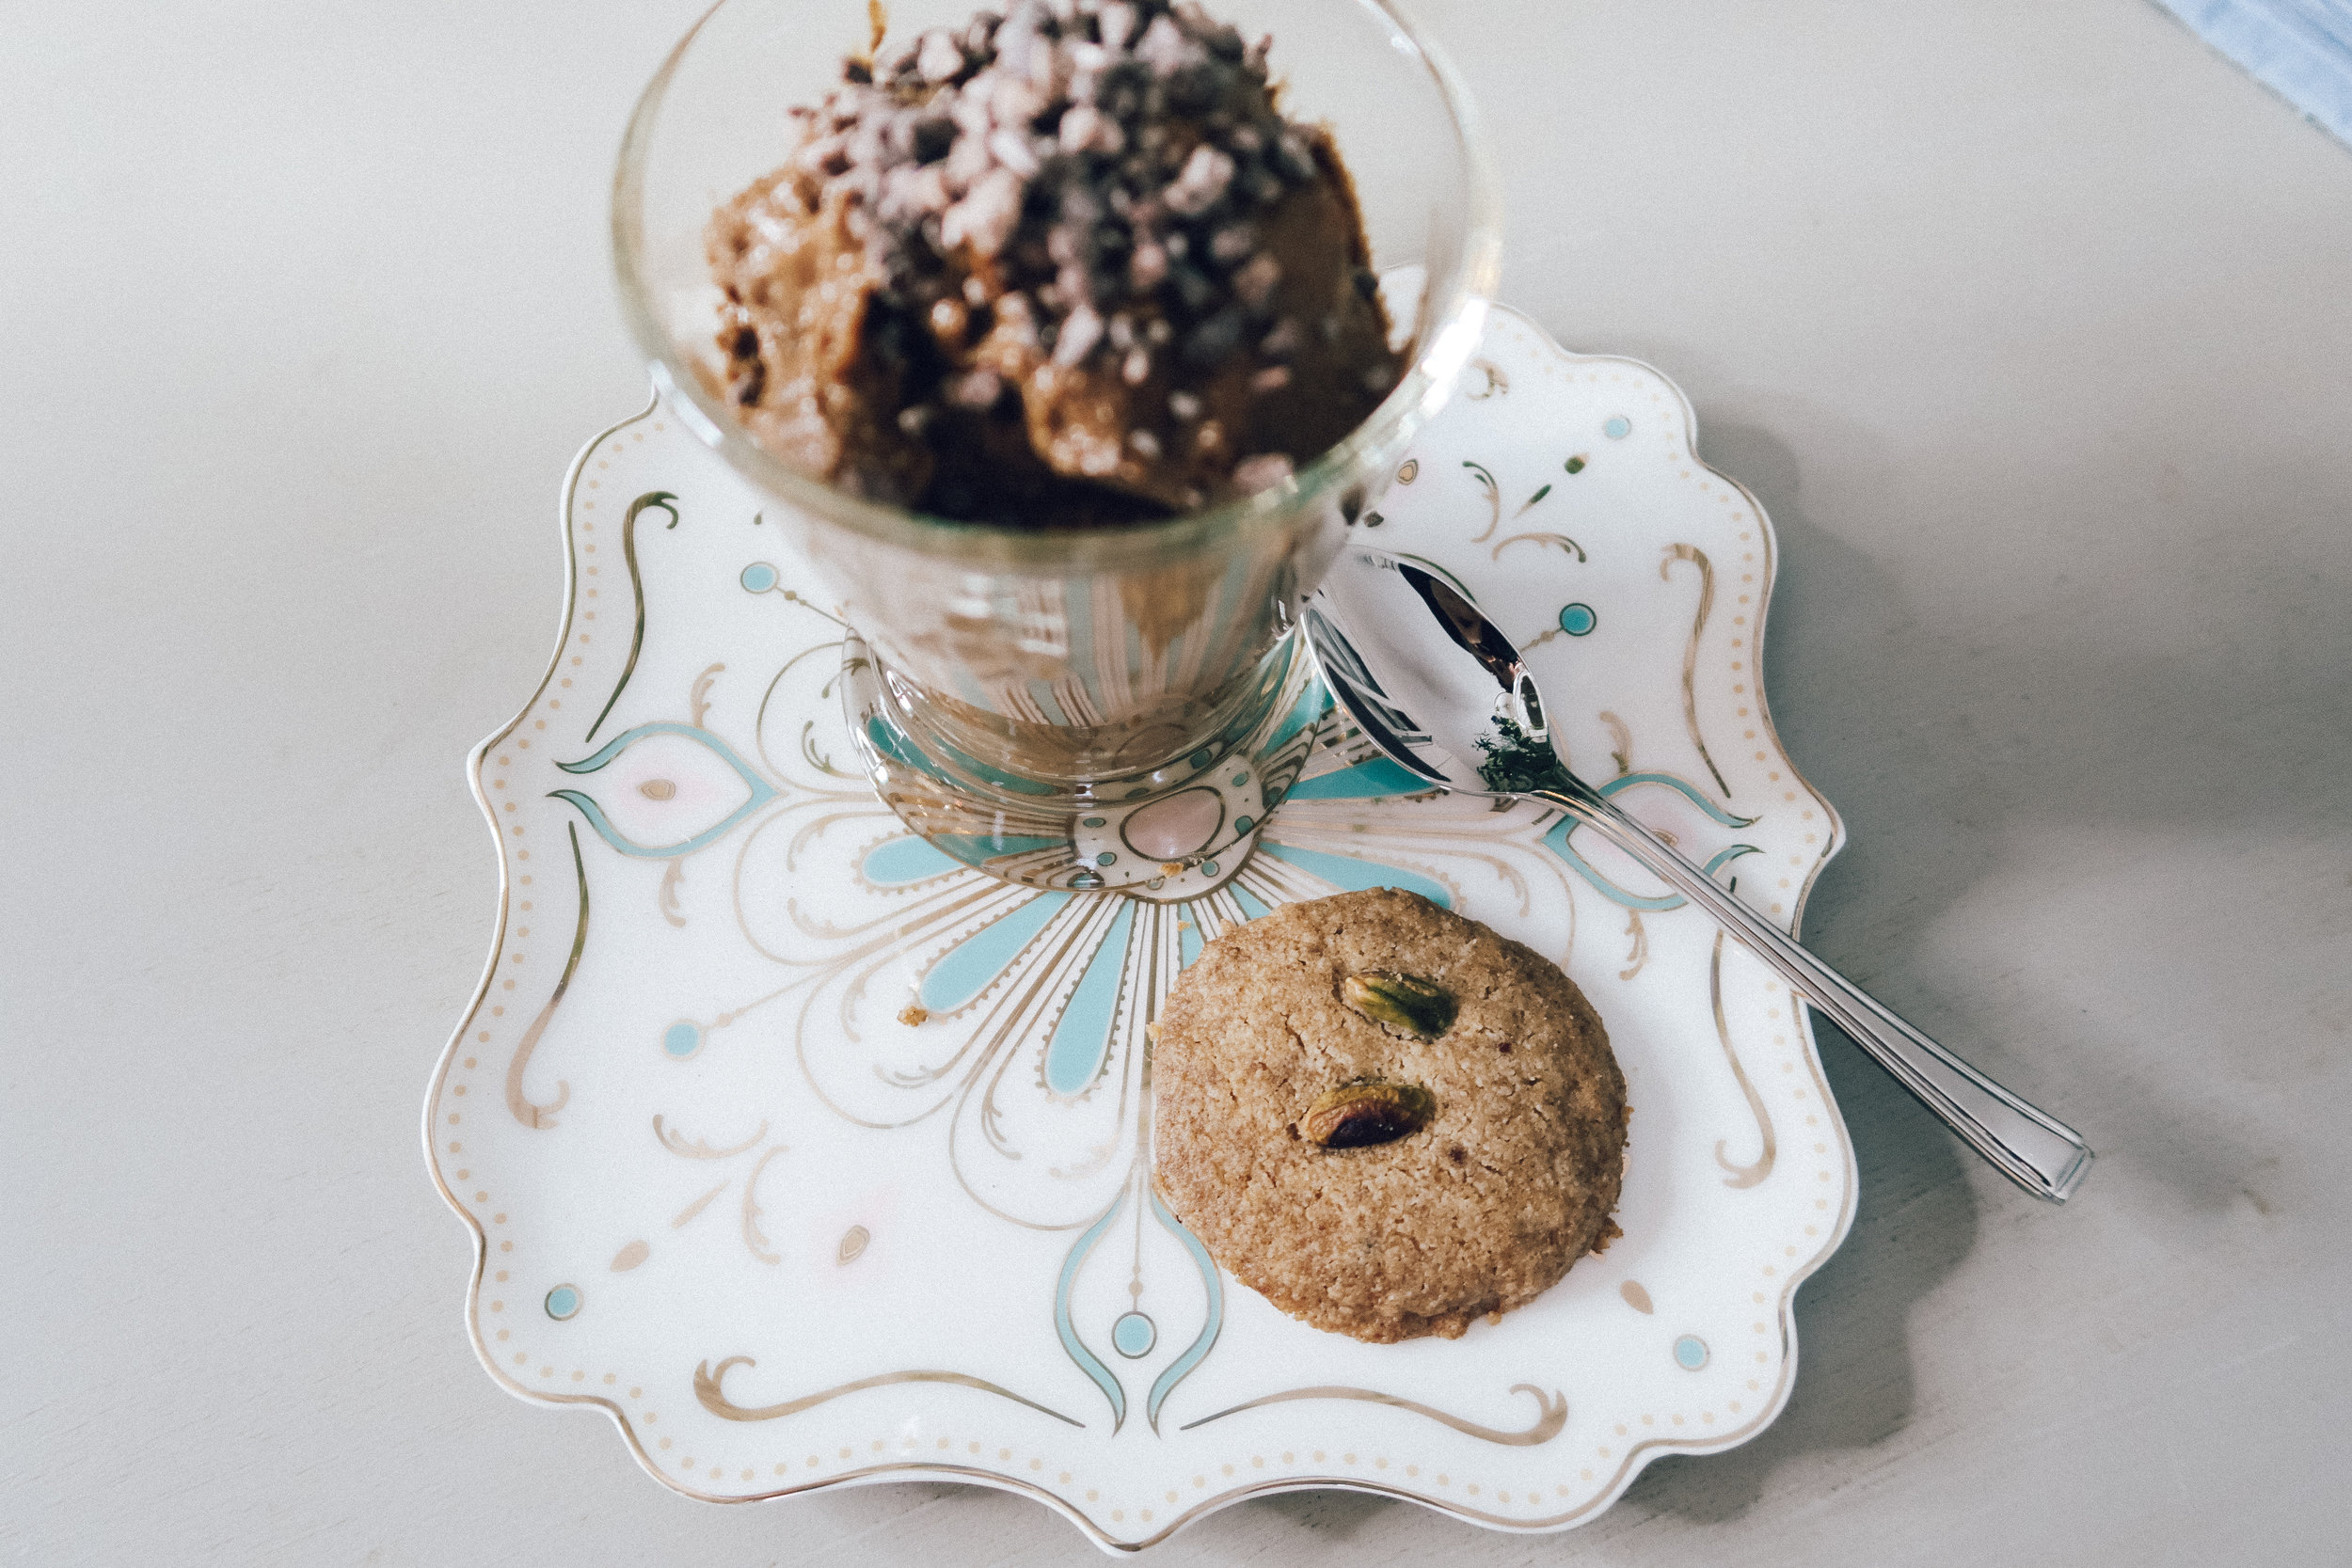 Raw Chocolate Mousse, Vegan Desserts, Holly White,